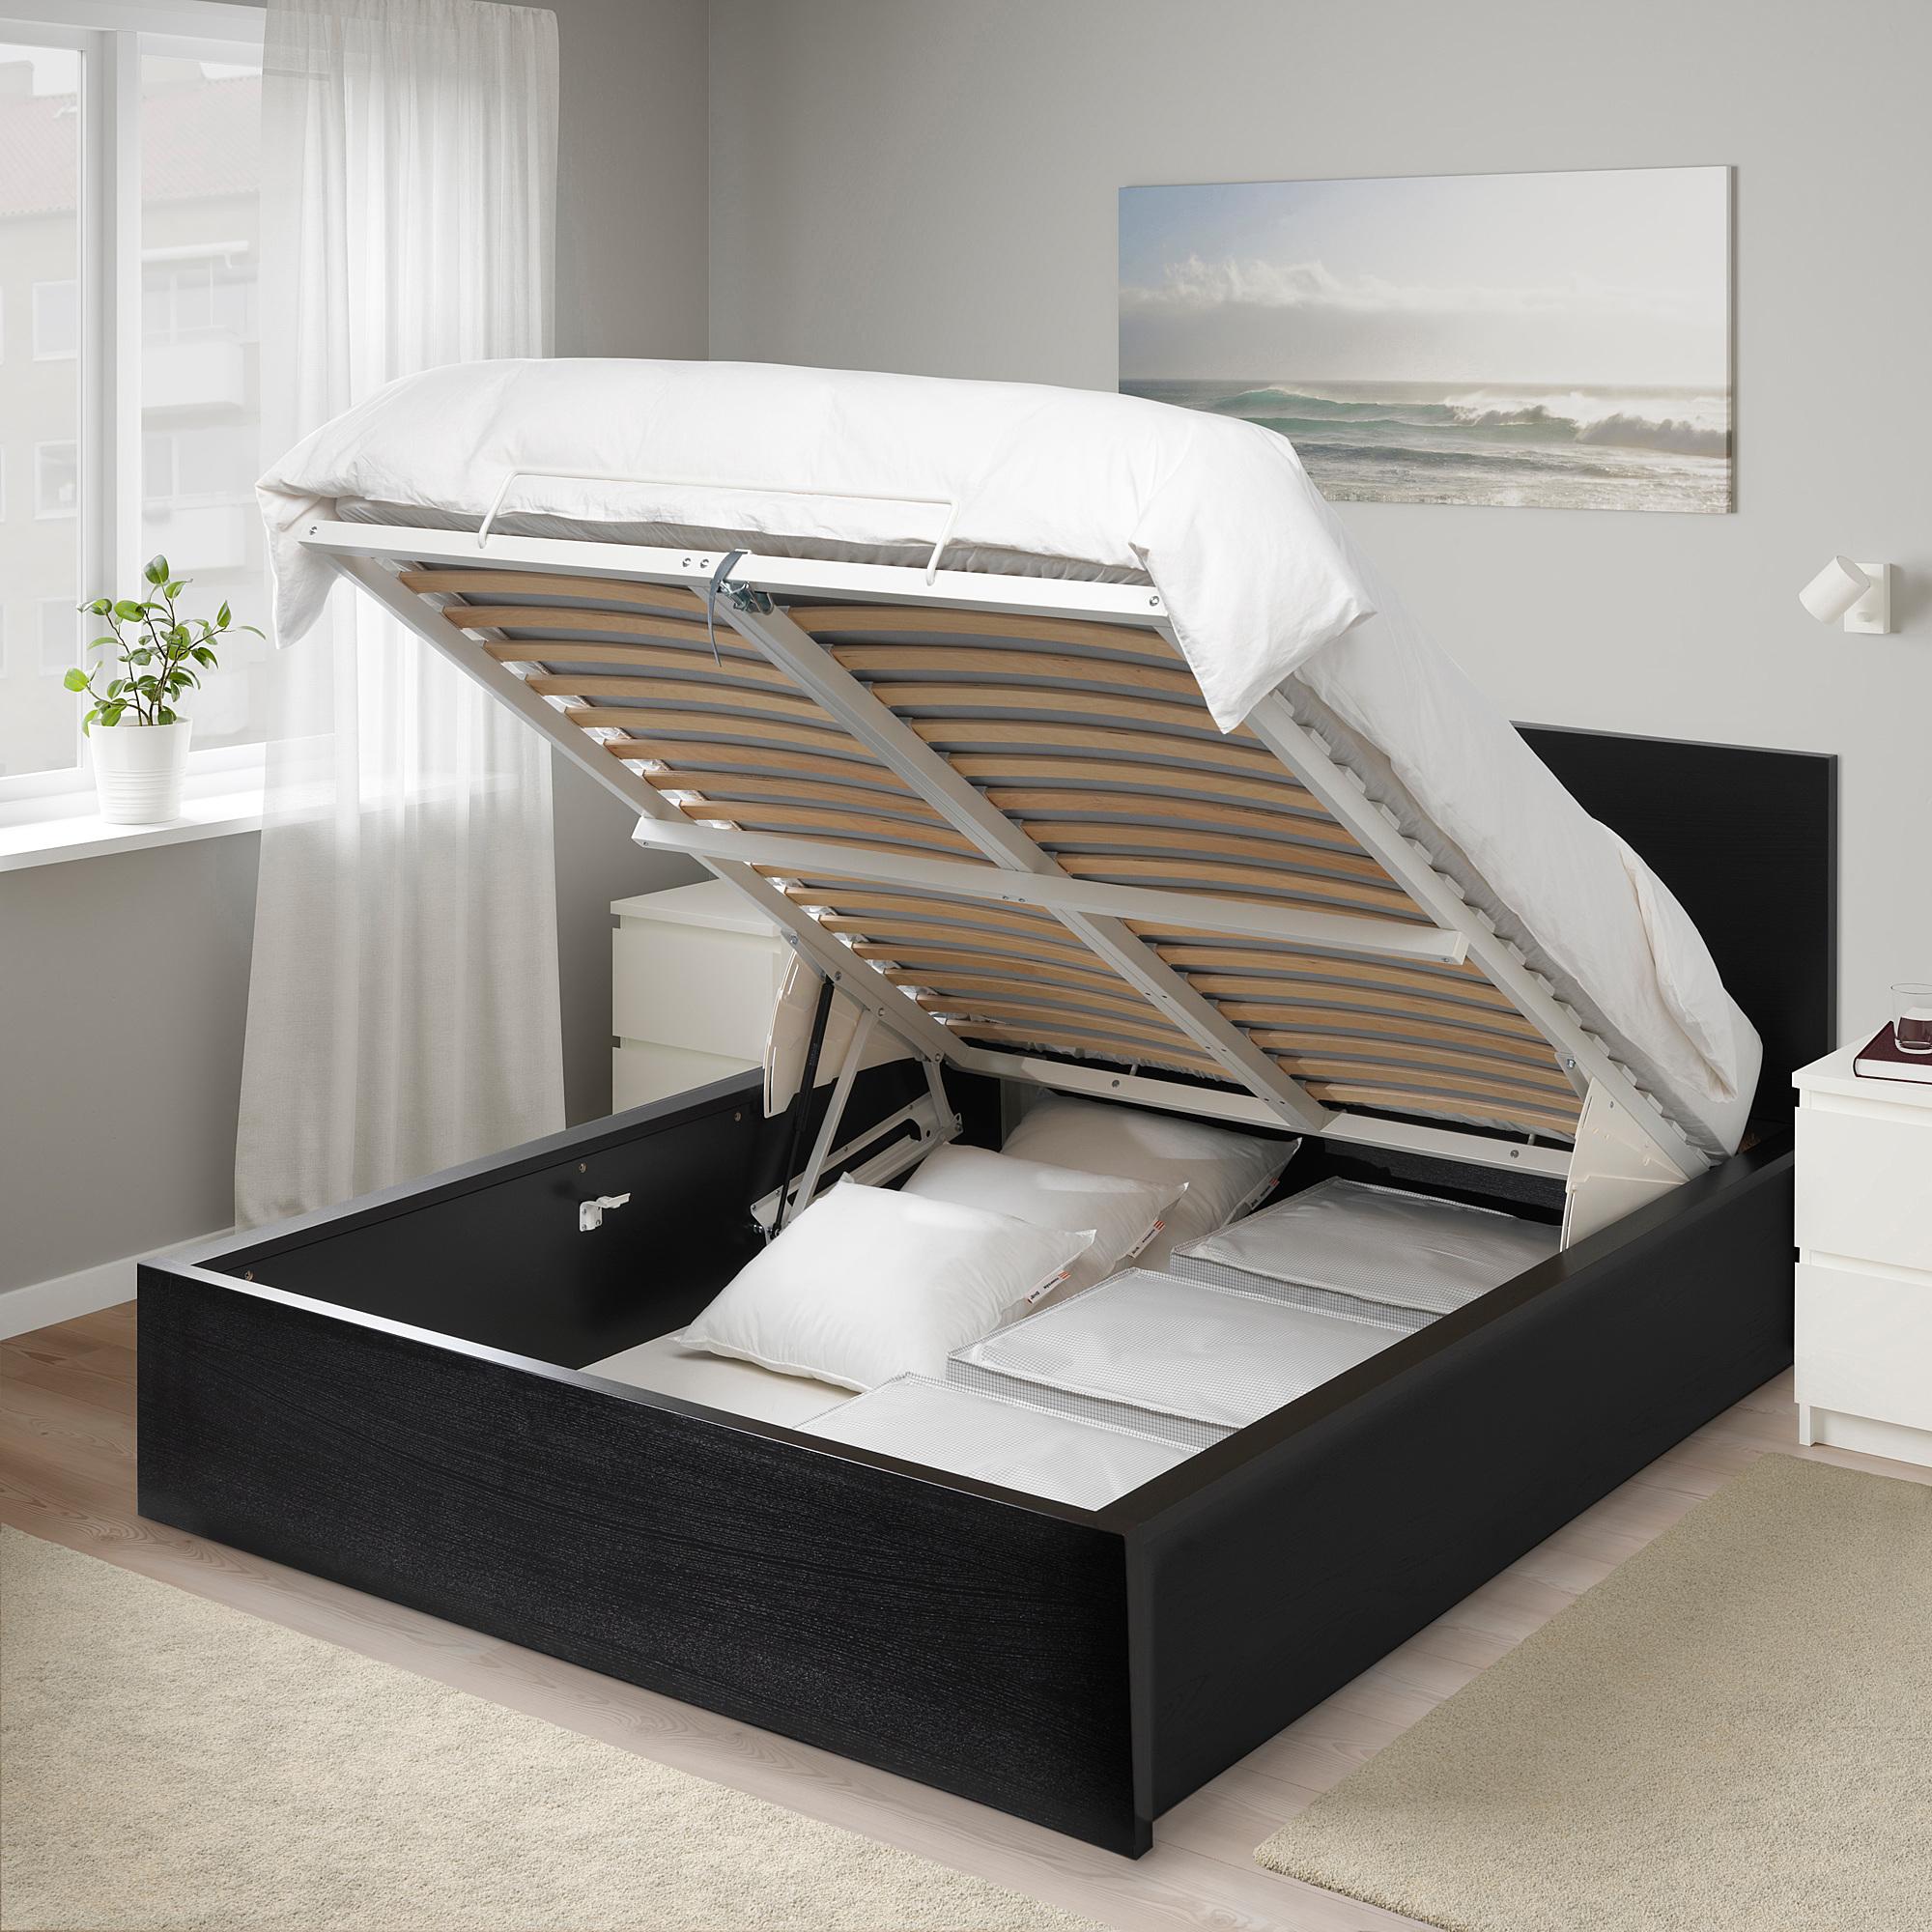 Remarkable Malm Ottoman Bed Double Ikea Hong Kong Beatyapartments Chair Design Images Beatyapartmentscom